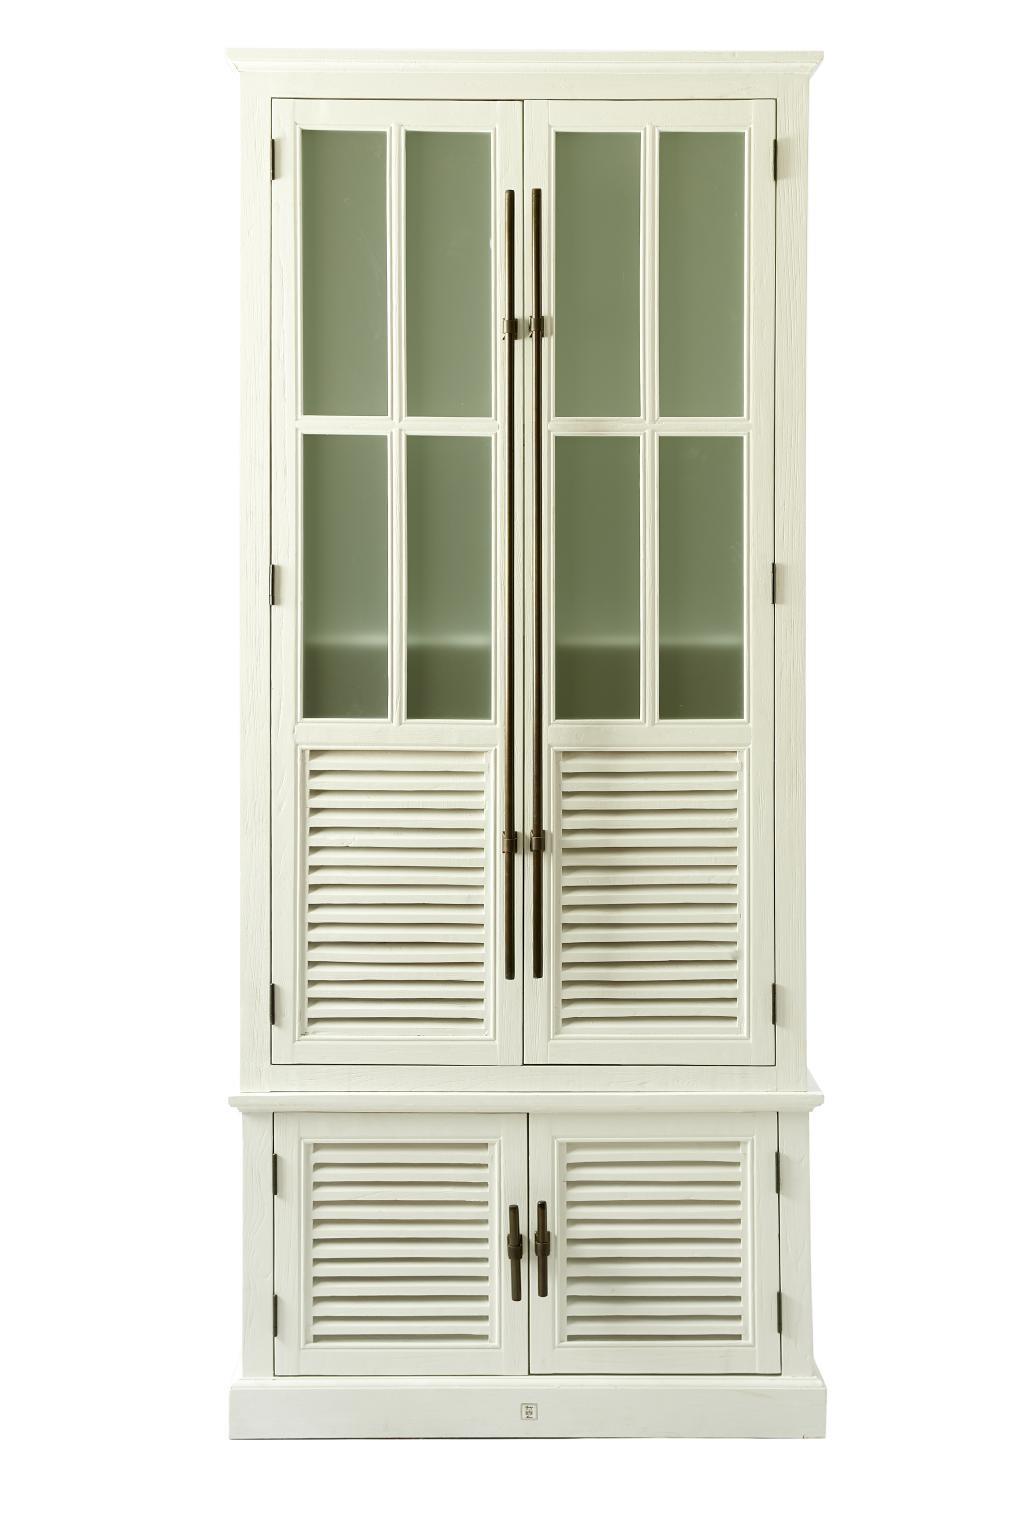 Biscayne Bay Wardrobe Cabinet Single / Rivièra Maison